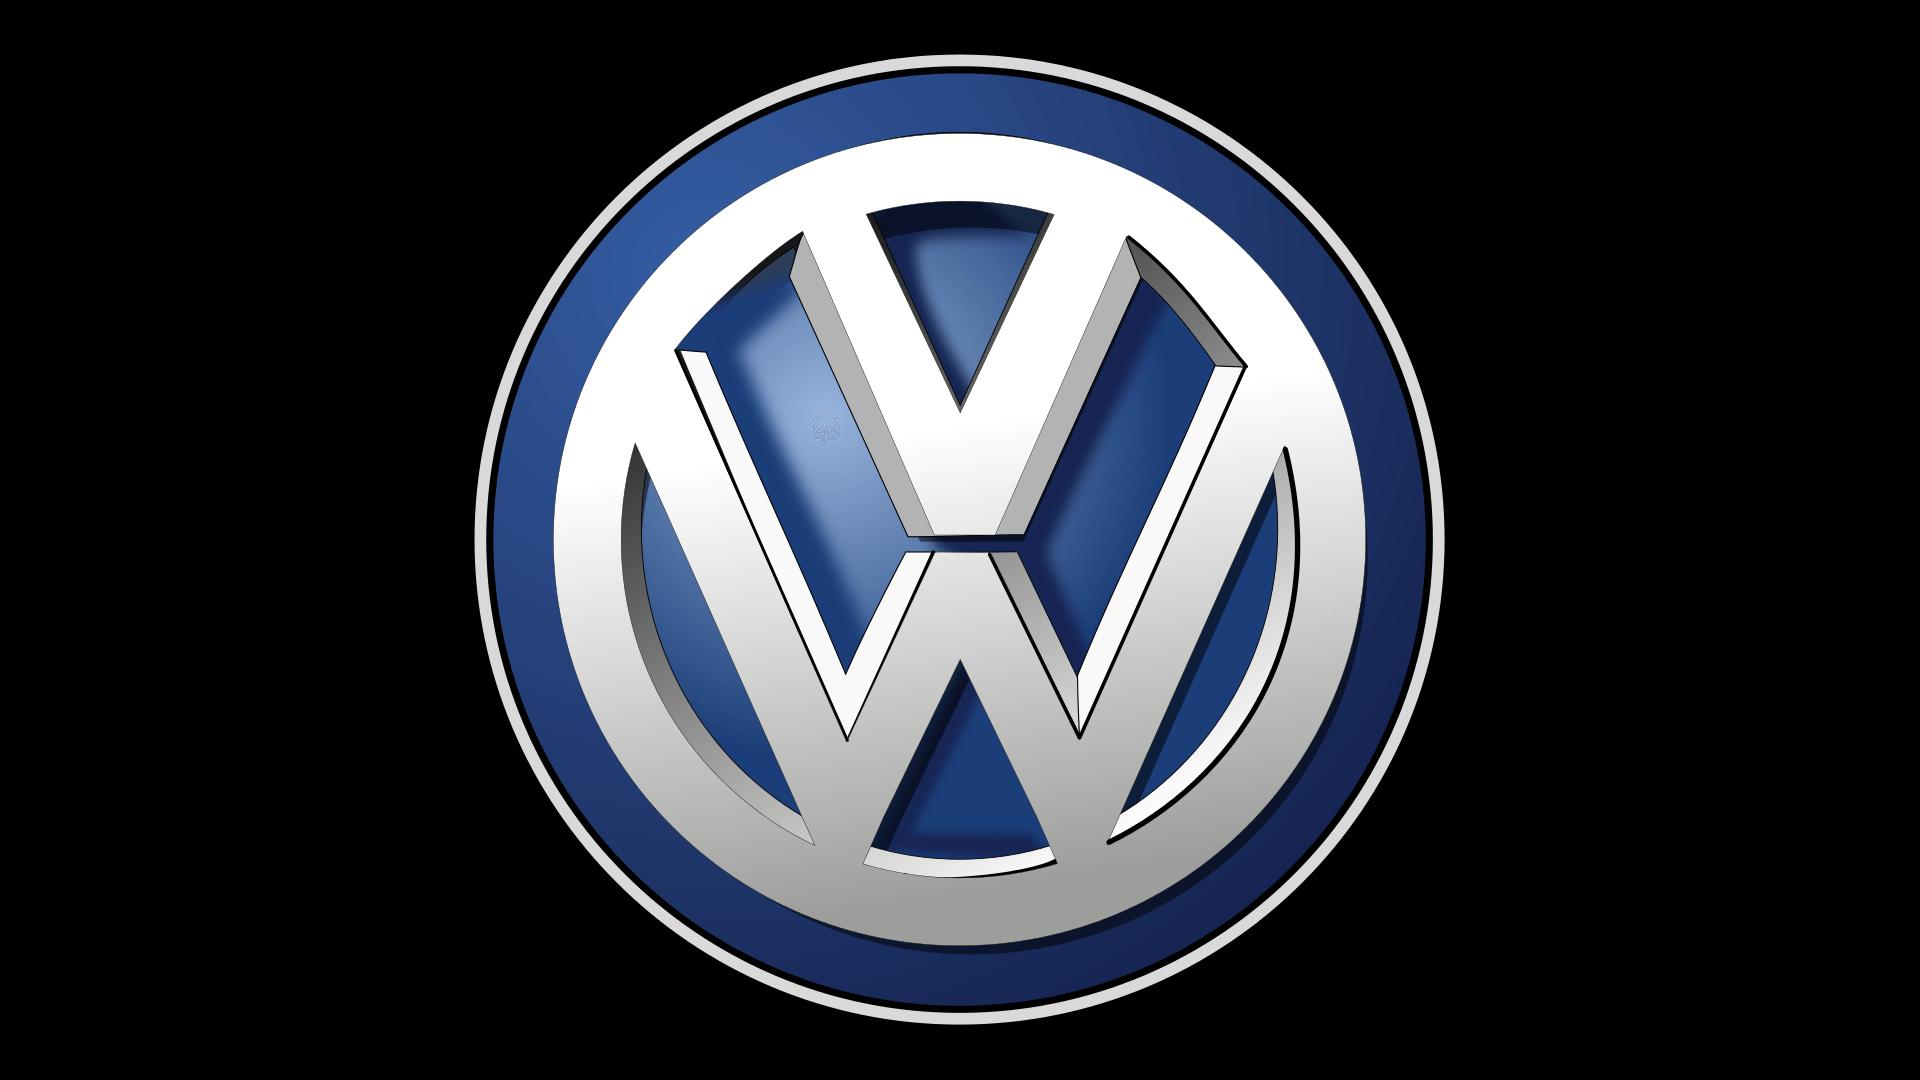 Car Logo Png - Free Transparent PNG Logos